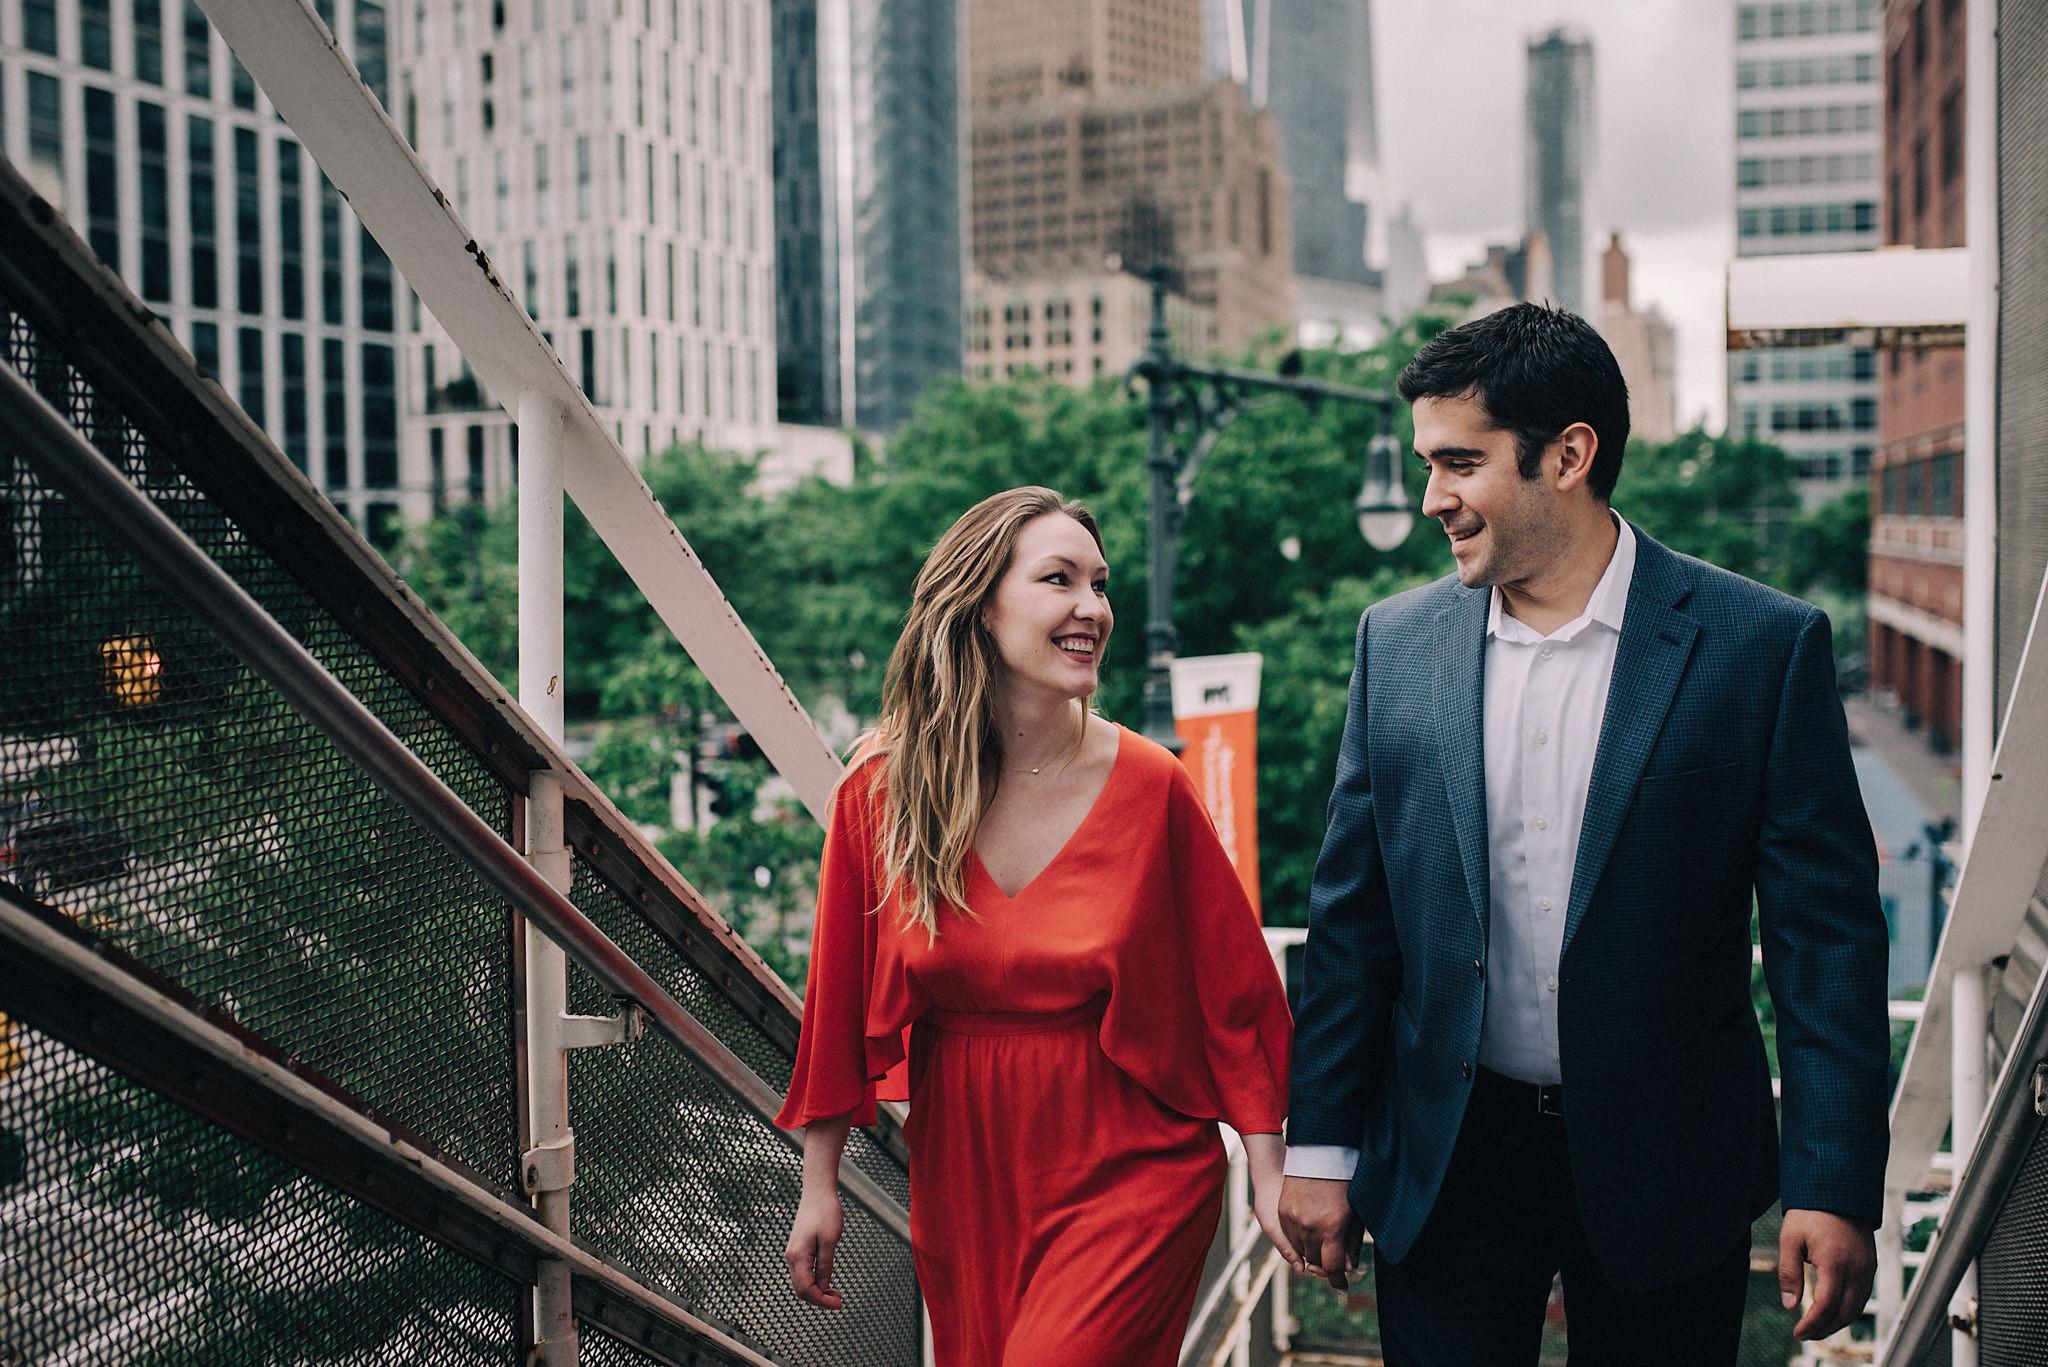 New-York-Trendy-Engagement-Photoshoot-Felipe-Carranza-7